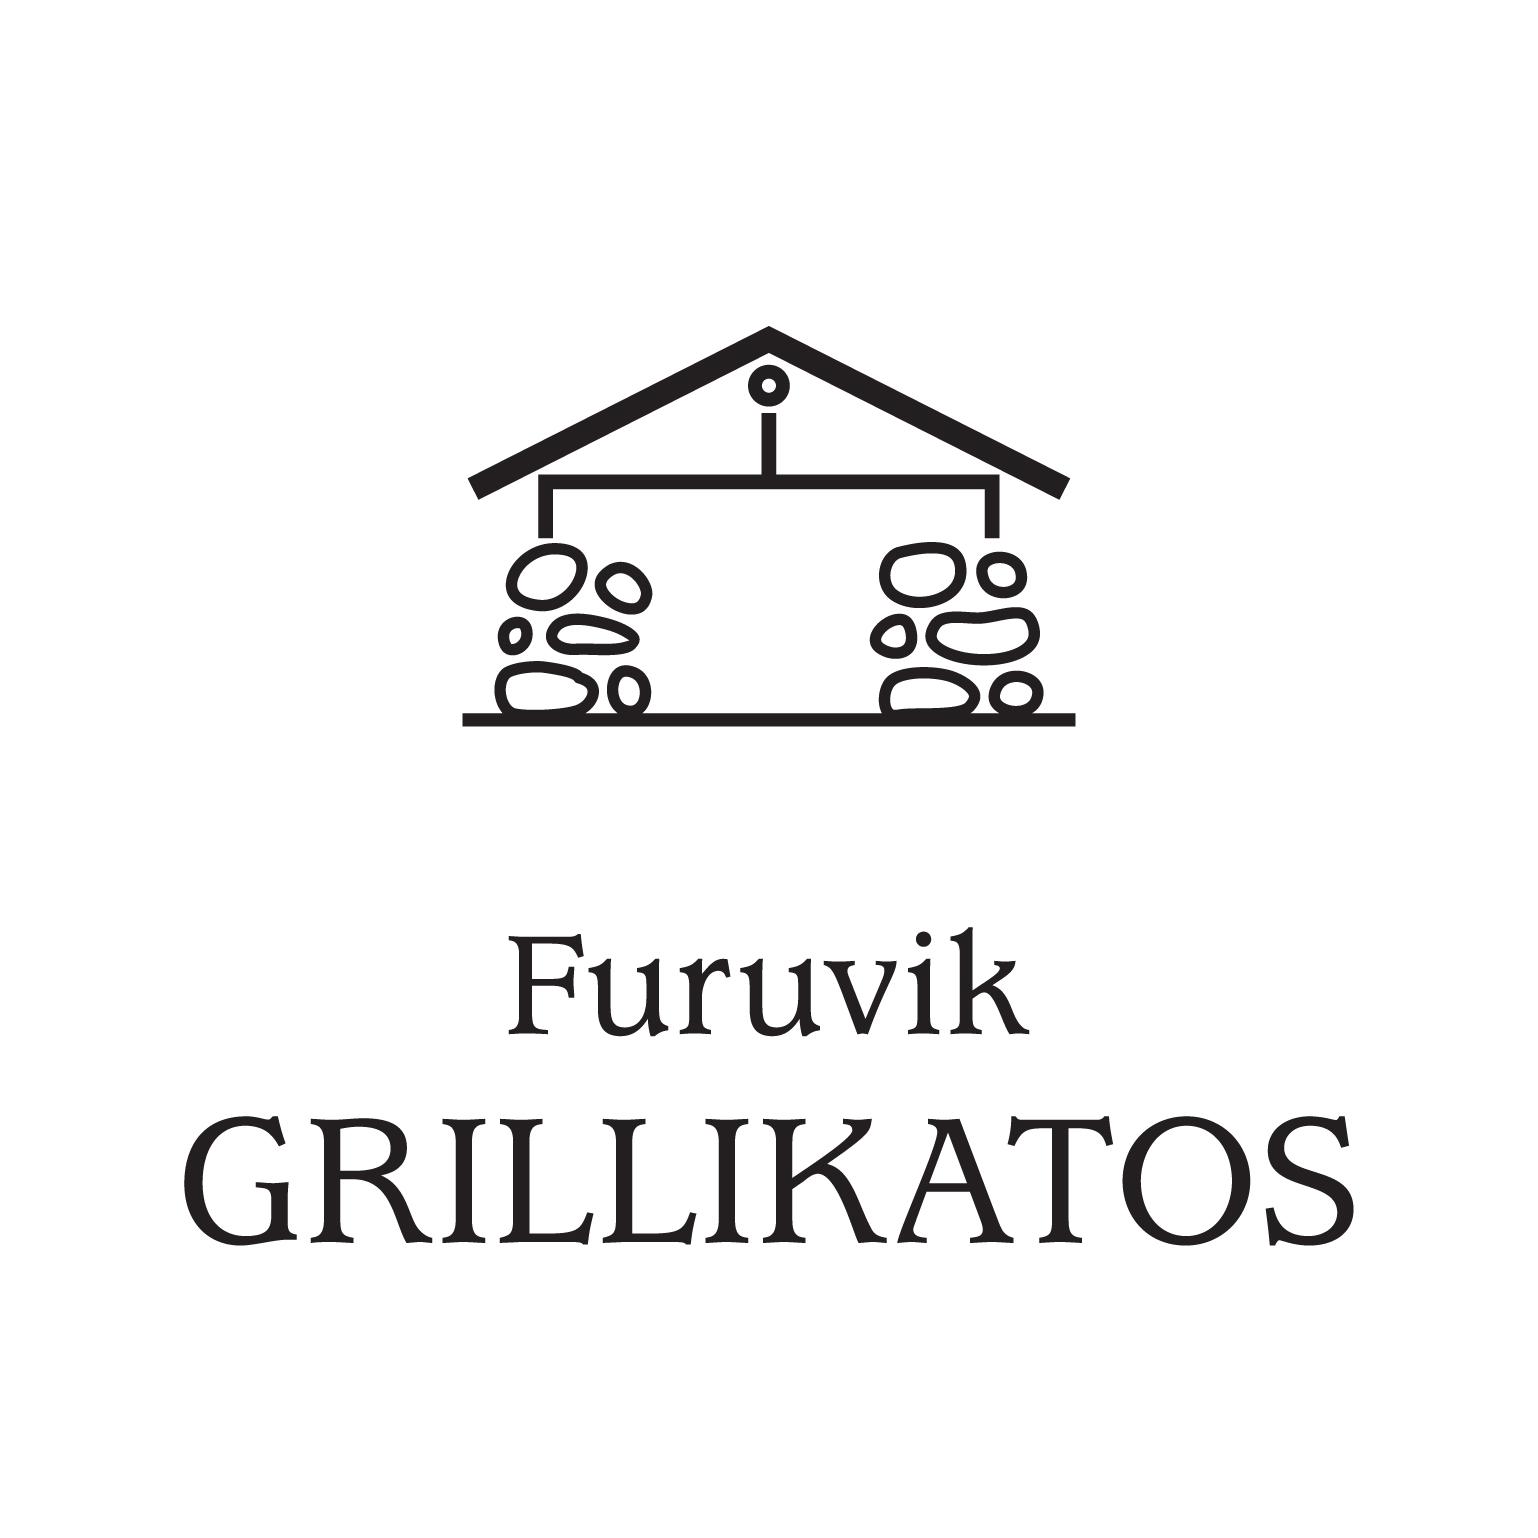 Villa Furuvik vuokratilat Grillikatos